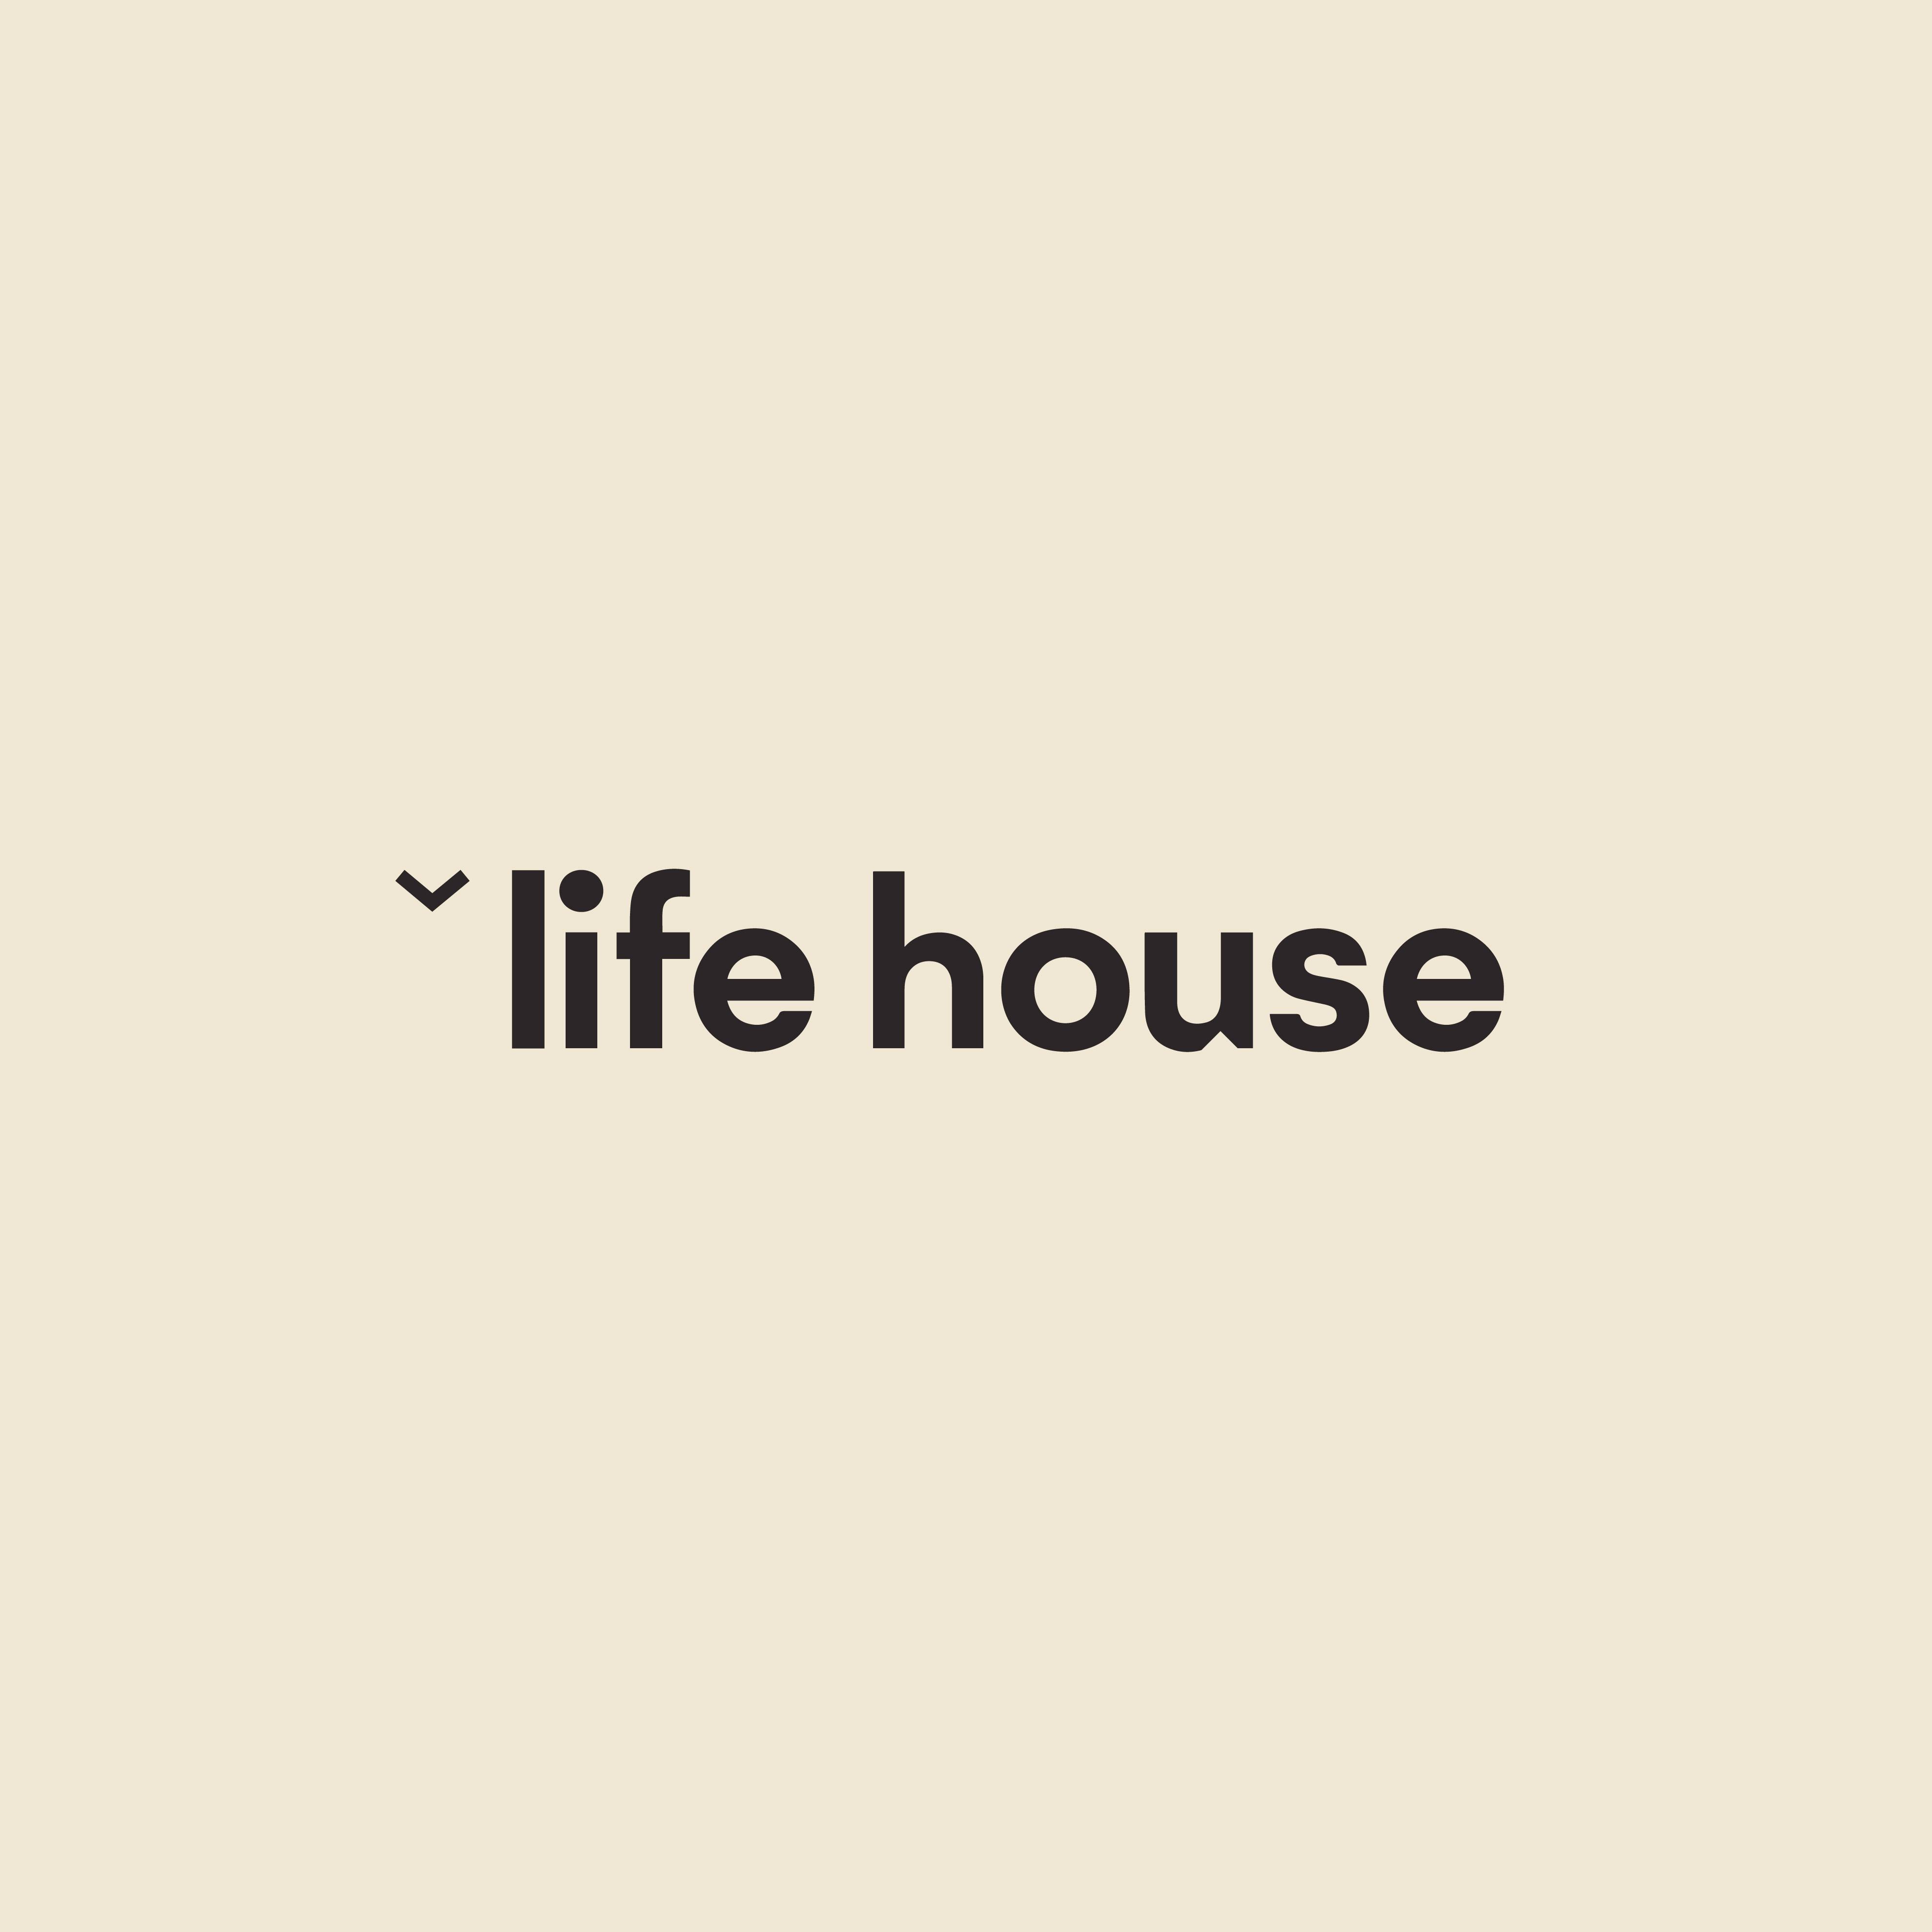 19.0304_LifeHouse-01